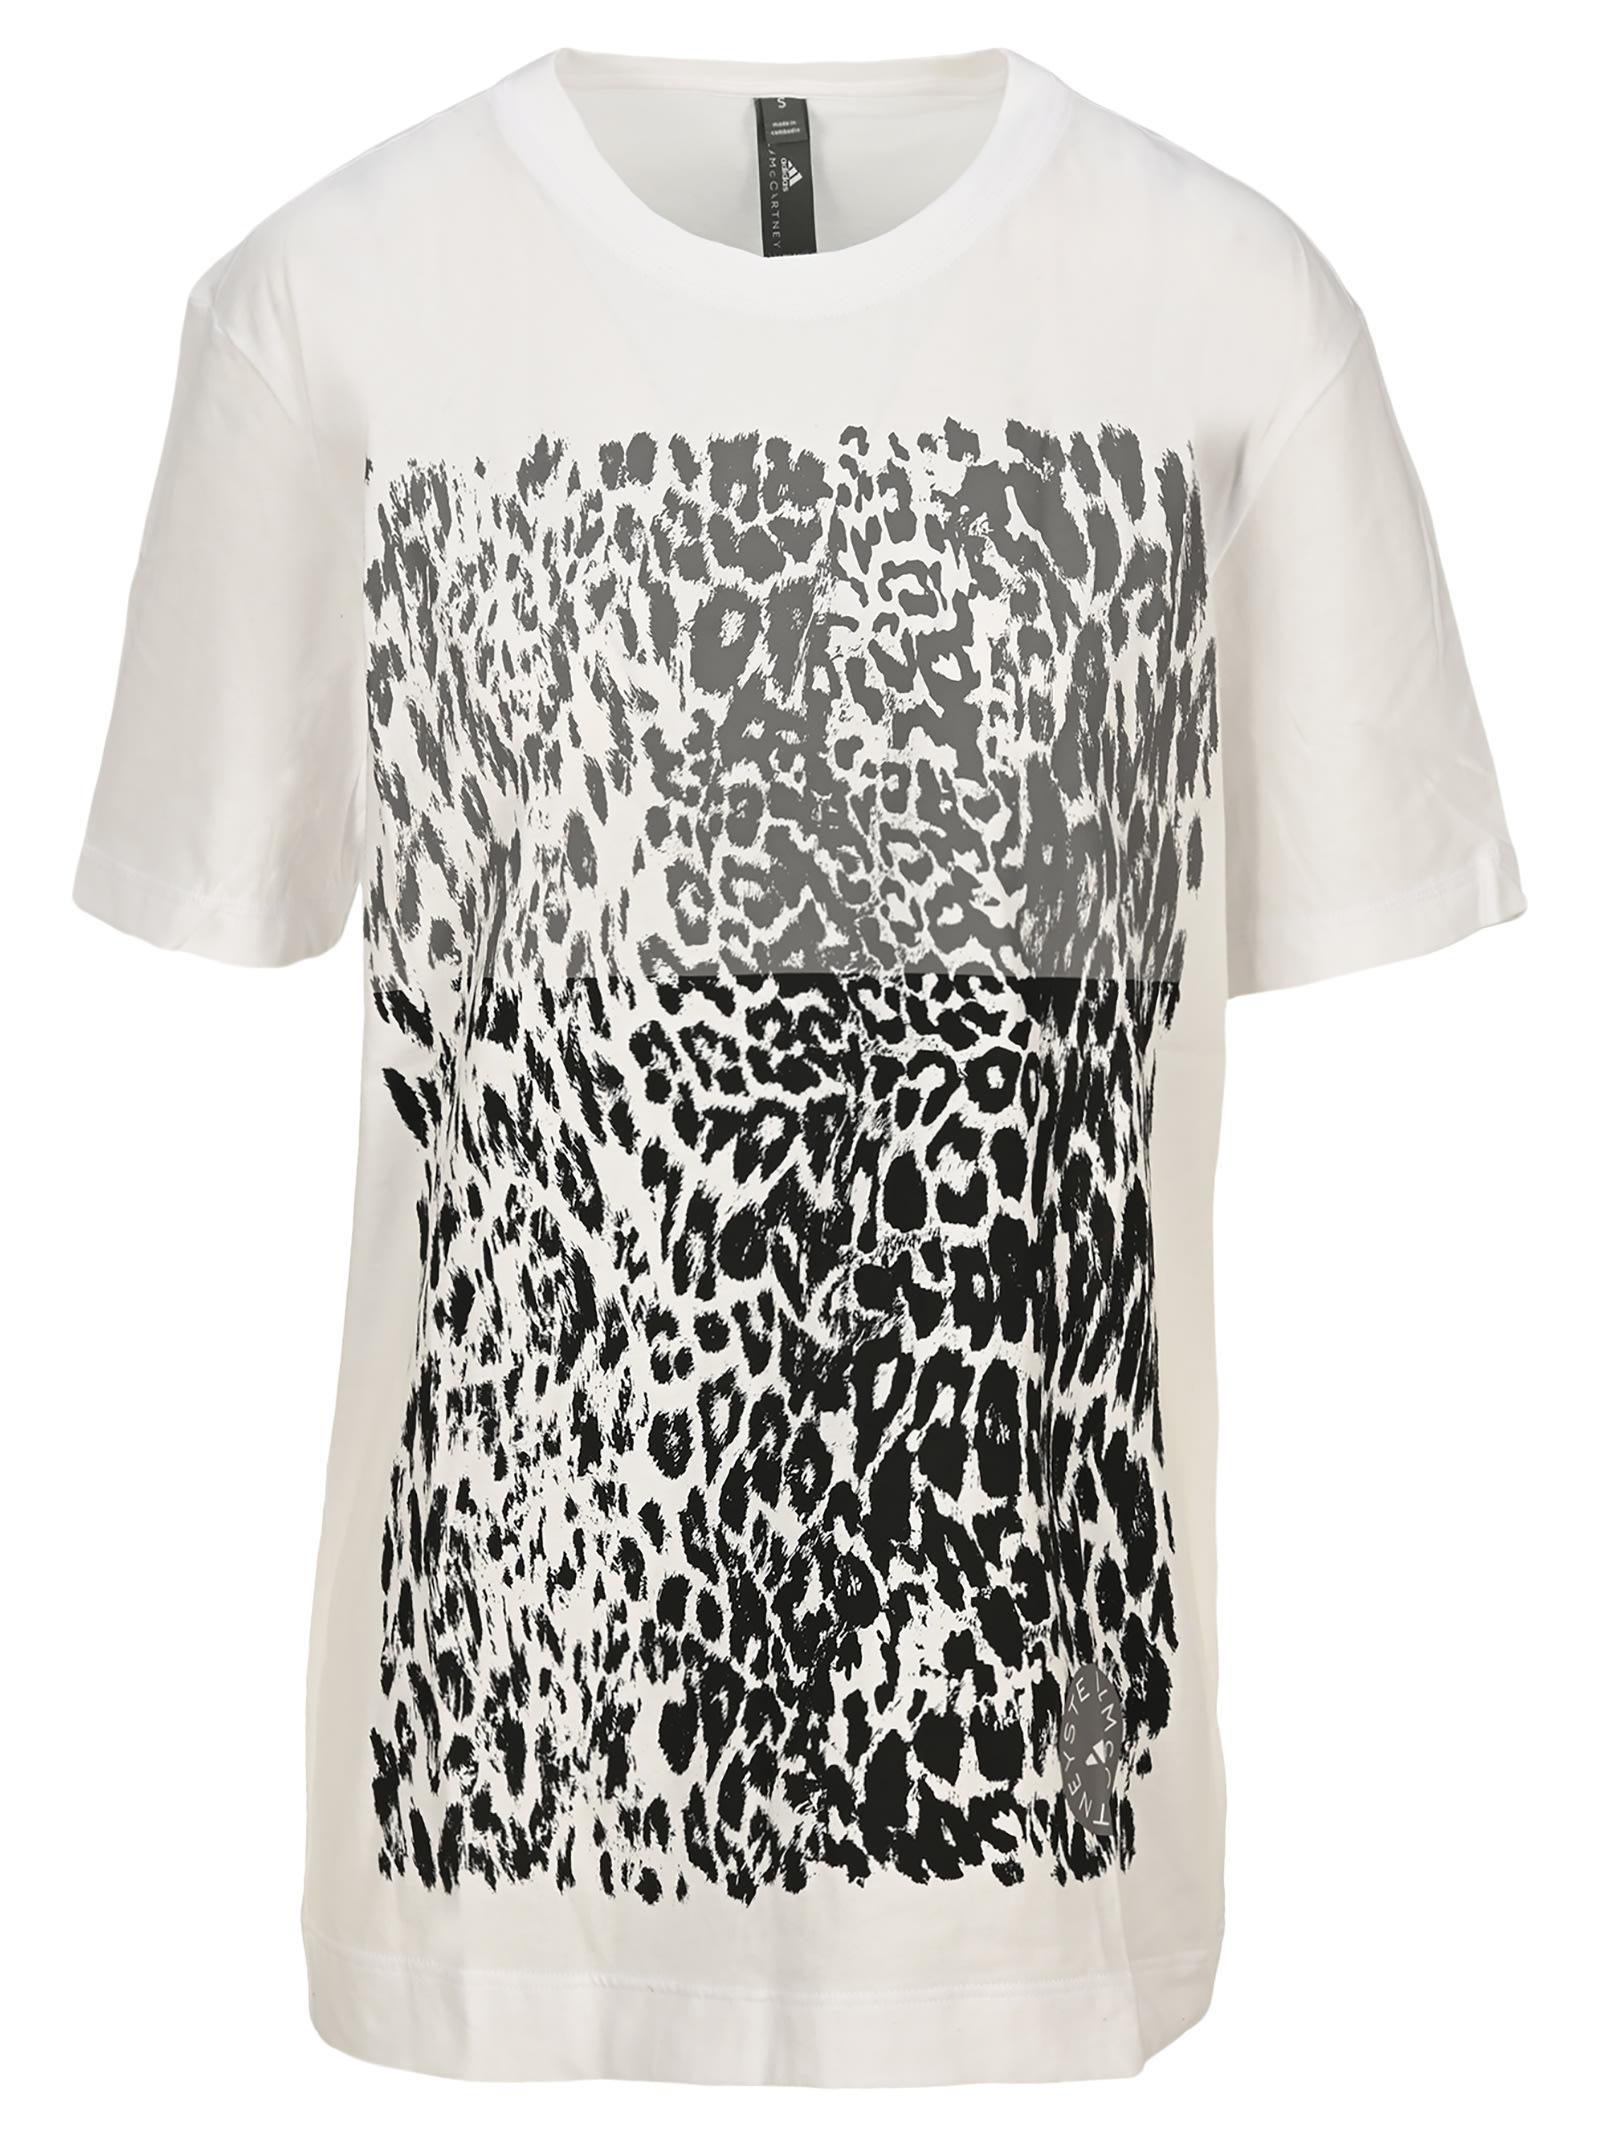 Adidas By Stella Mccartney Graphic Training T-shirt